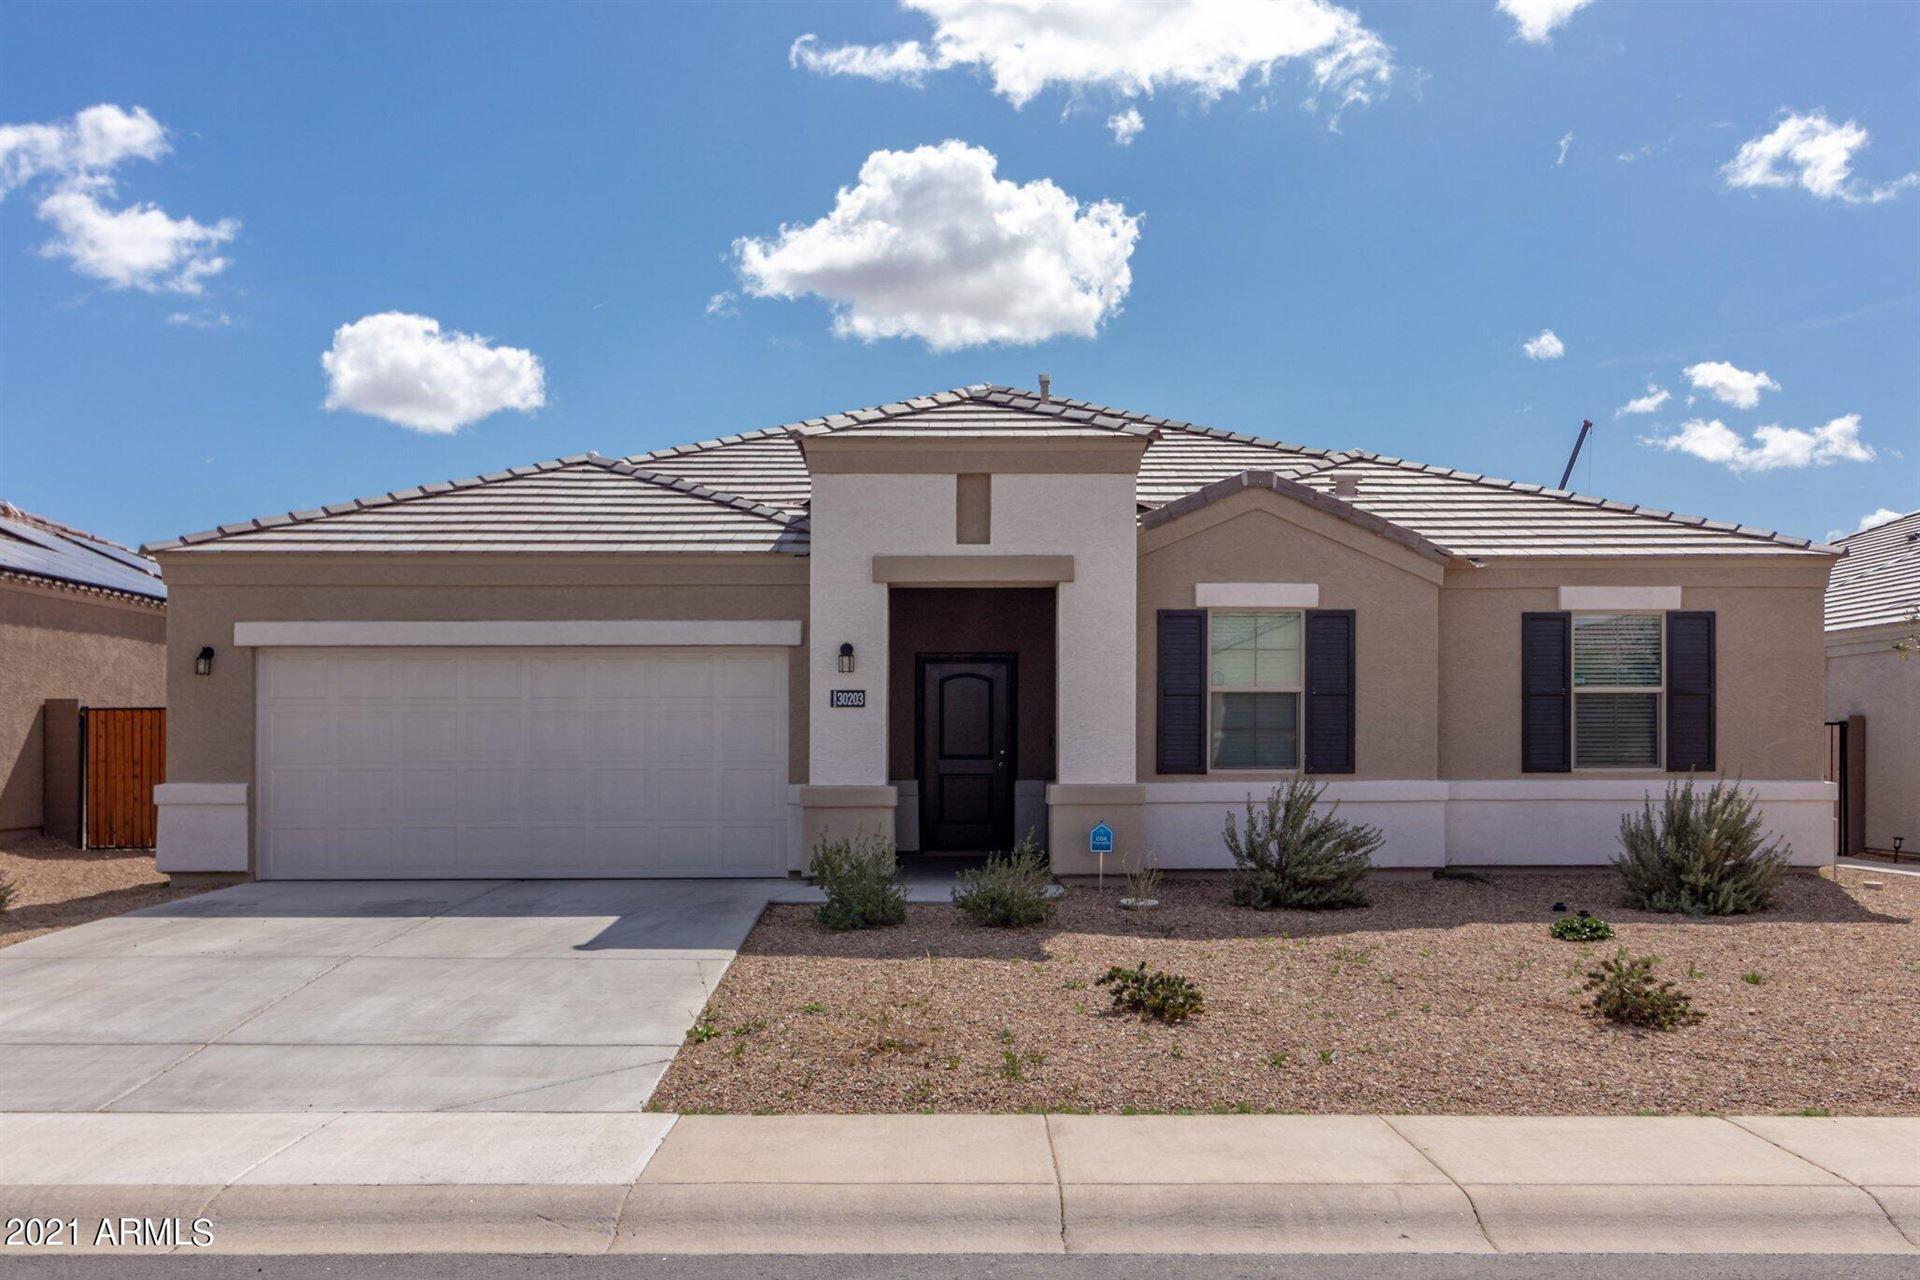 Photo of 30203 W FAIRMOUNT Avenue, Buckeye, AZ 85396 (MLS # 6203687)